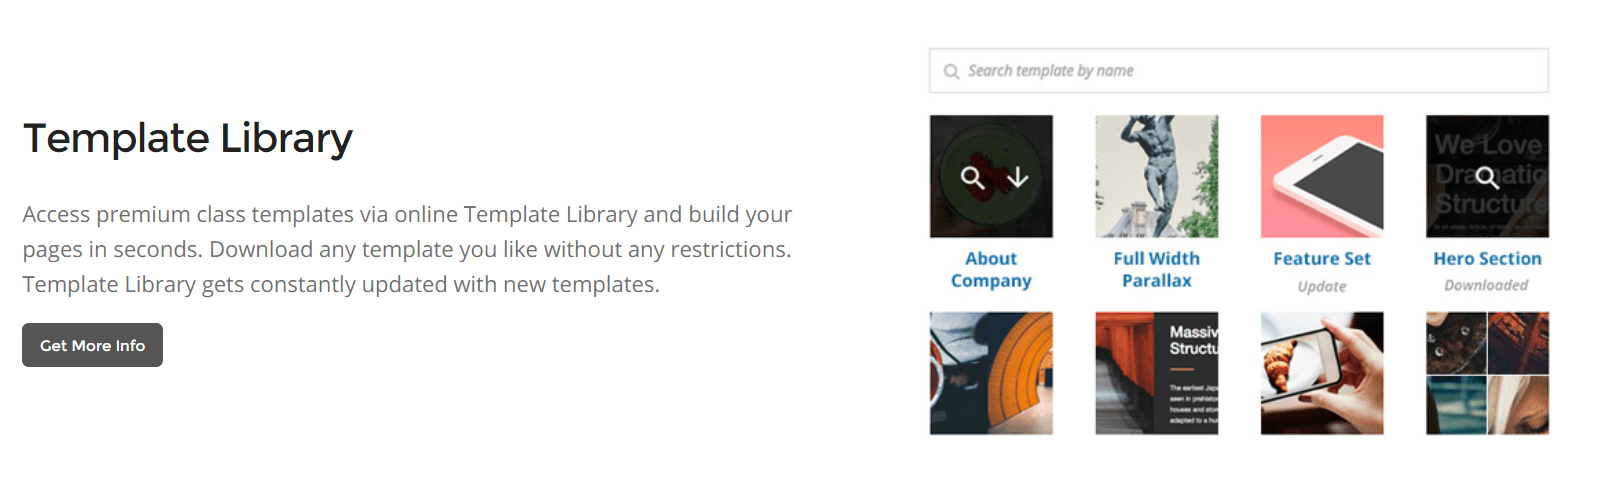 WPBakery-website-templates